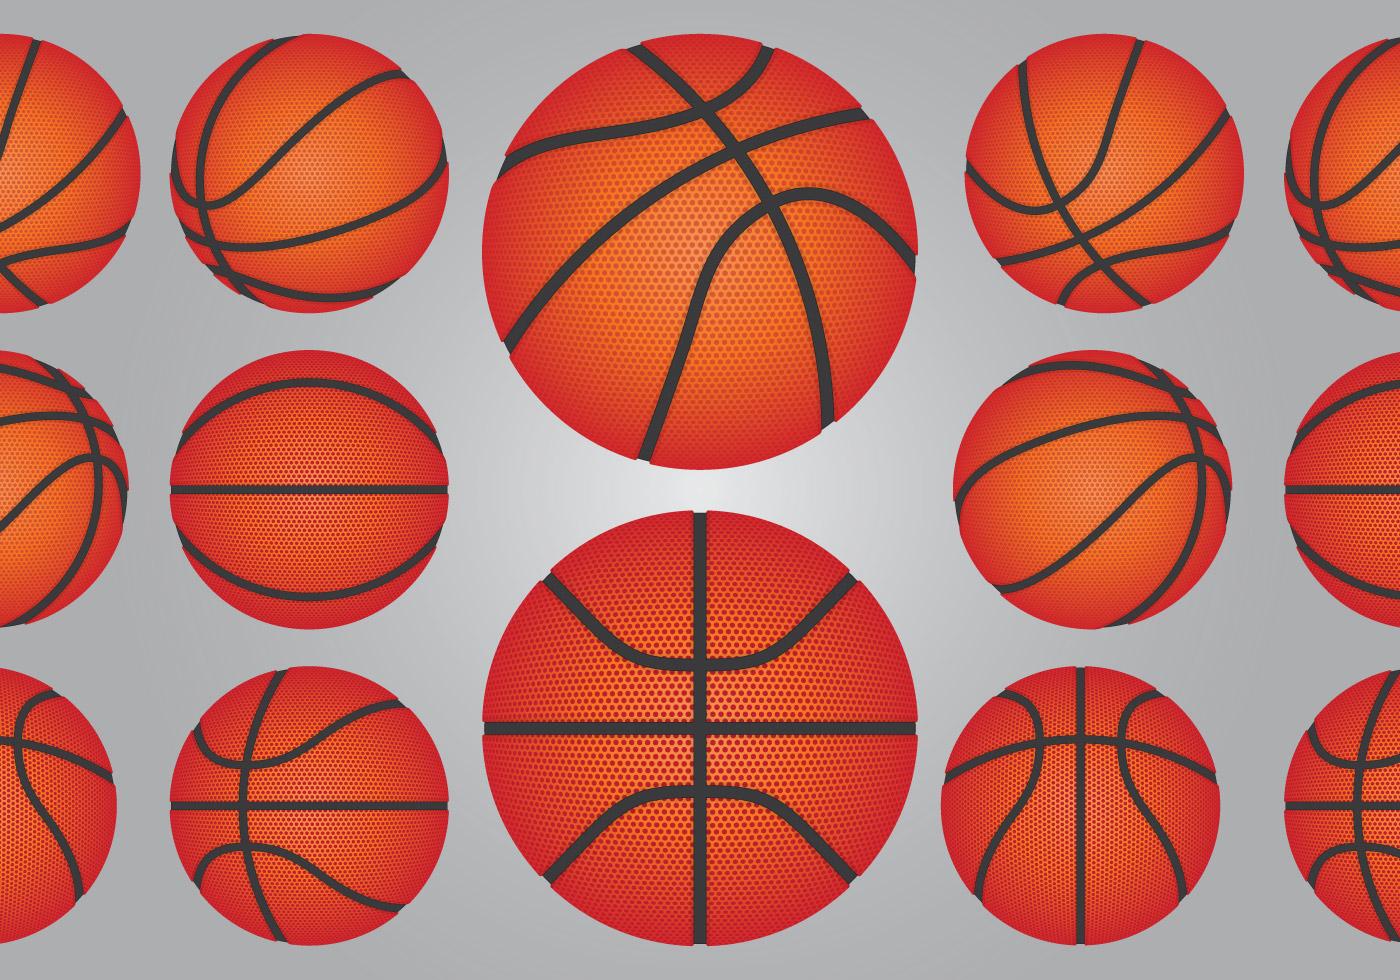 Basketball Ball Set Download Free Vector Art Stock